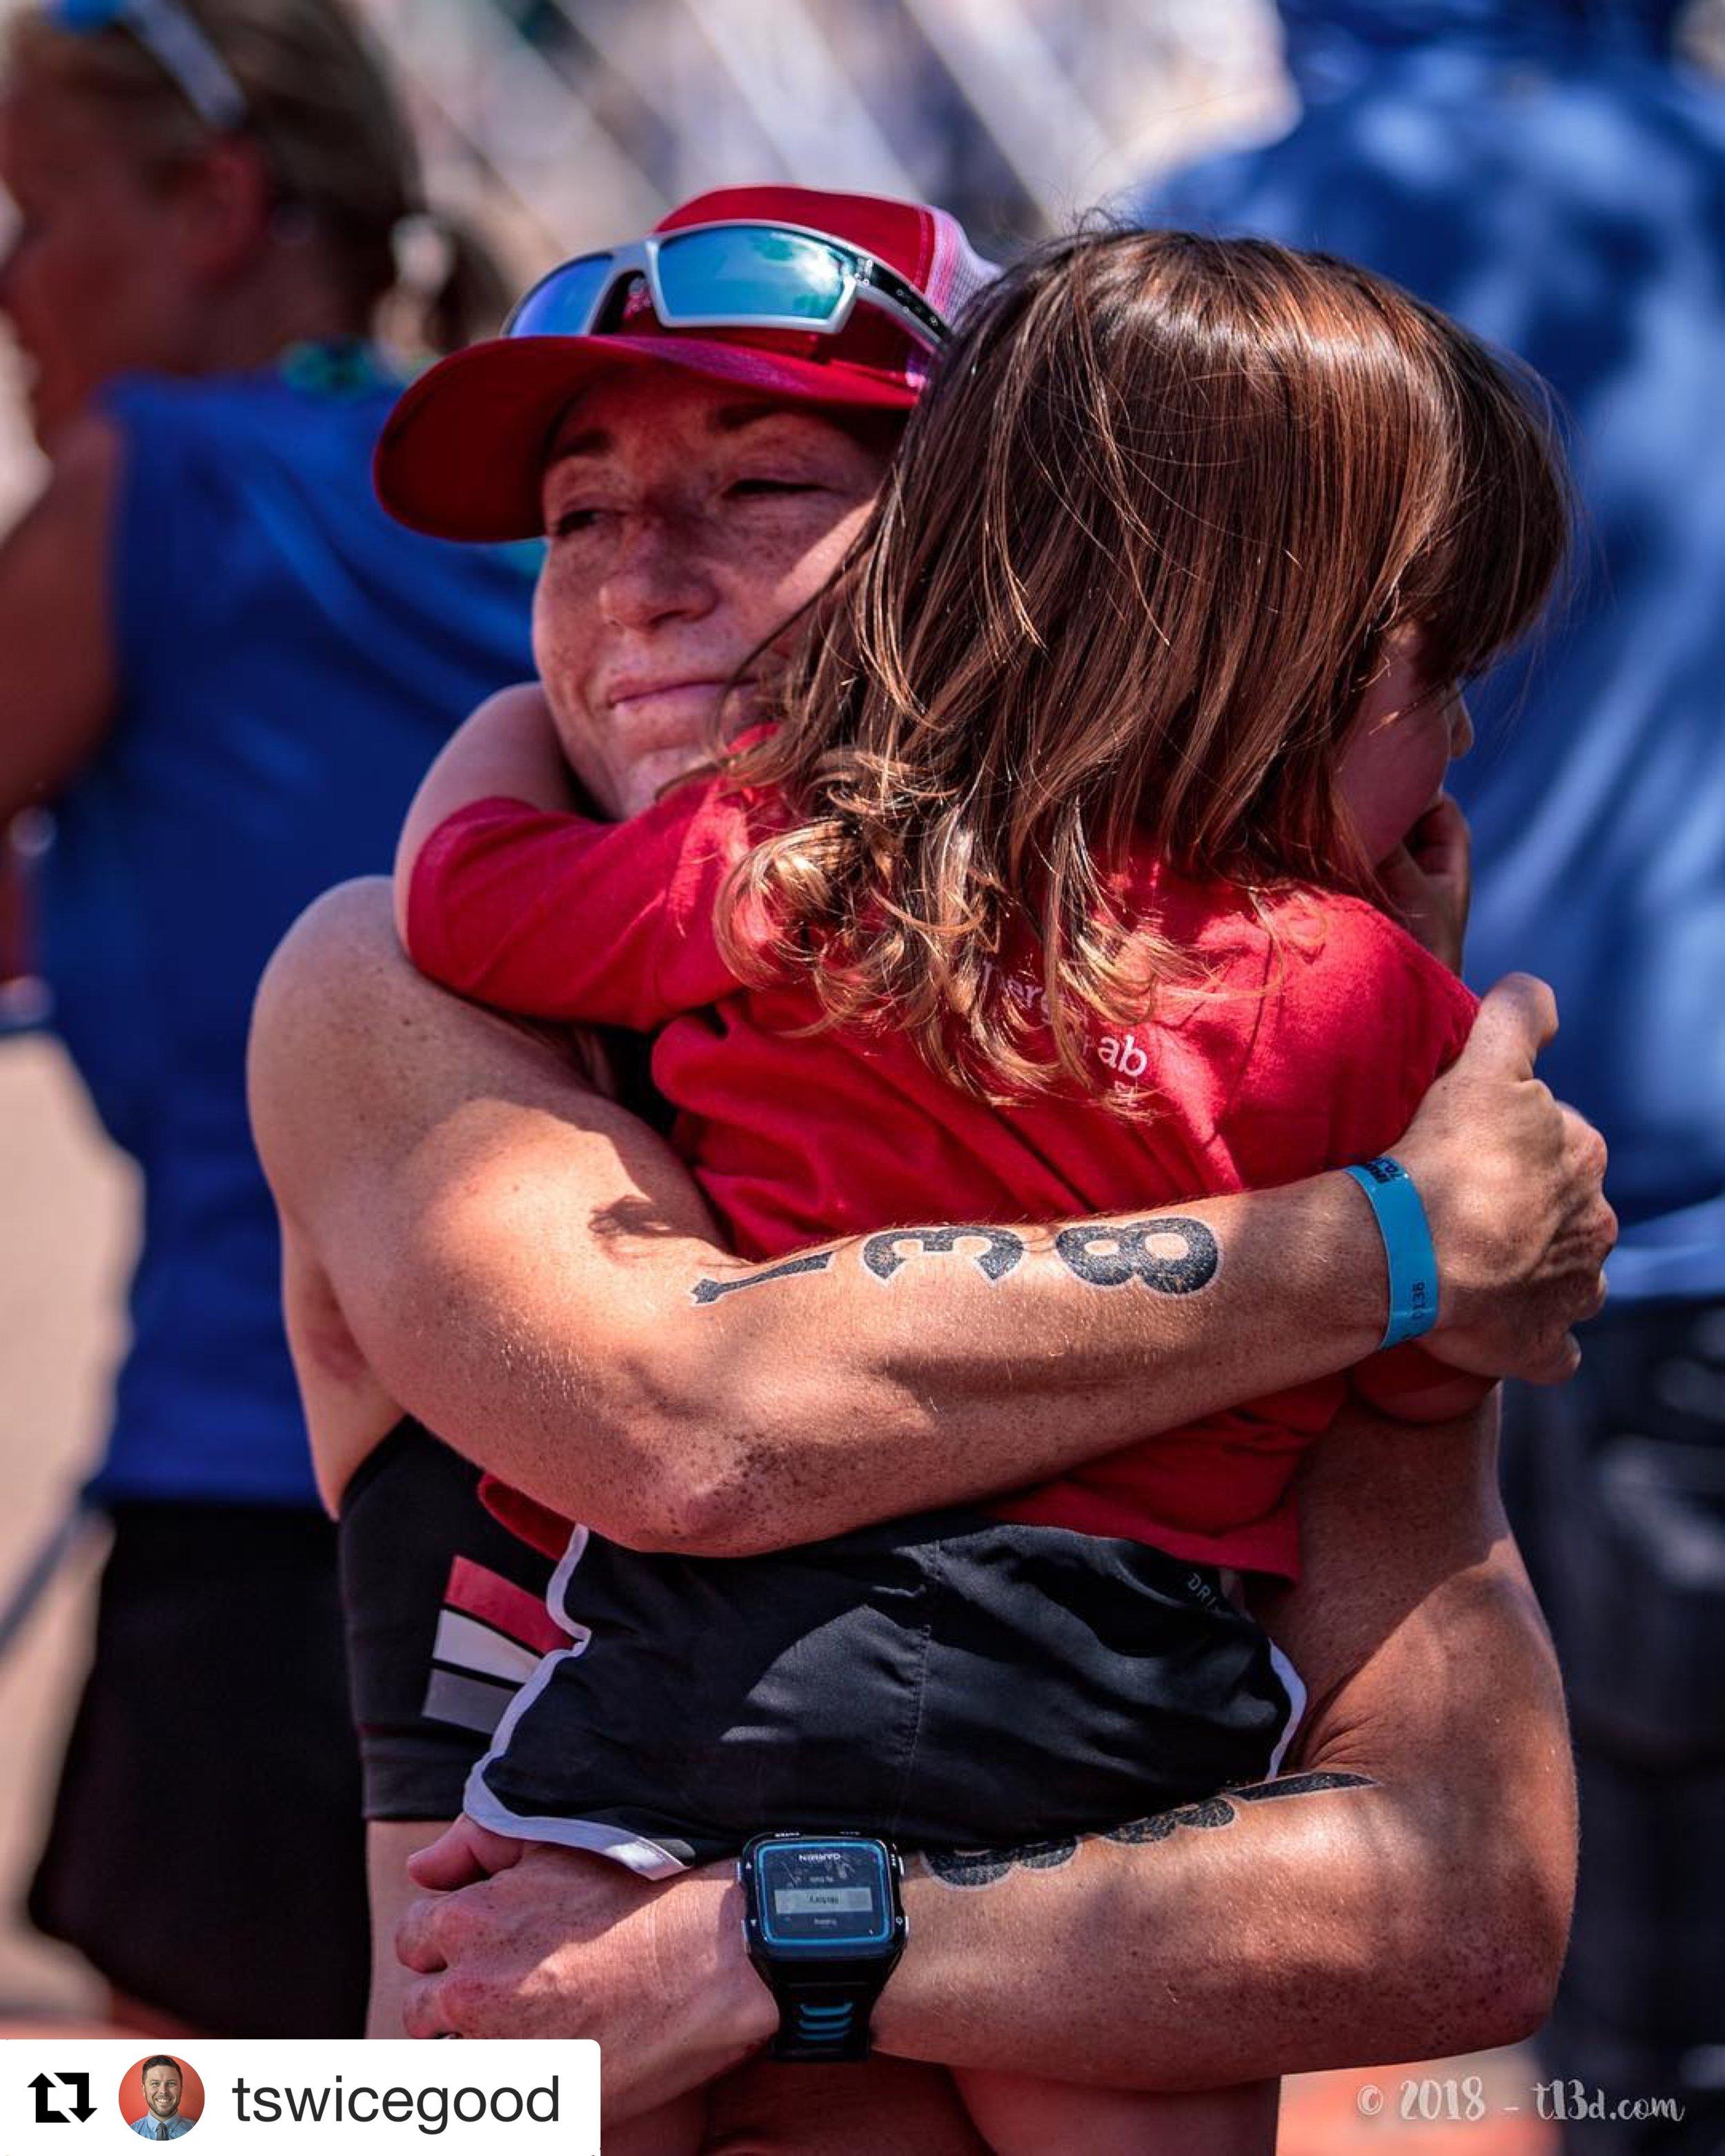 Hugging my sweet Ada after finishing Ironman 70.3 Buffalo Springs Lake. (Photo by Travis Swicegood)